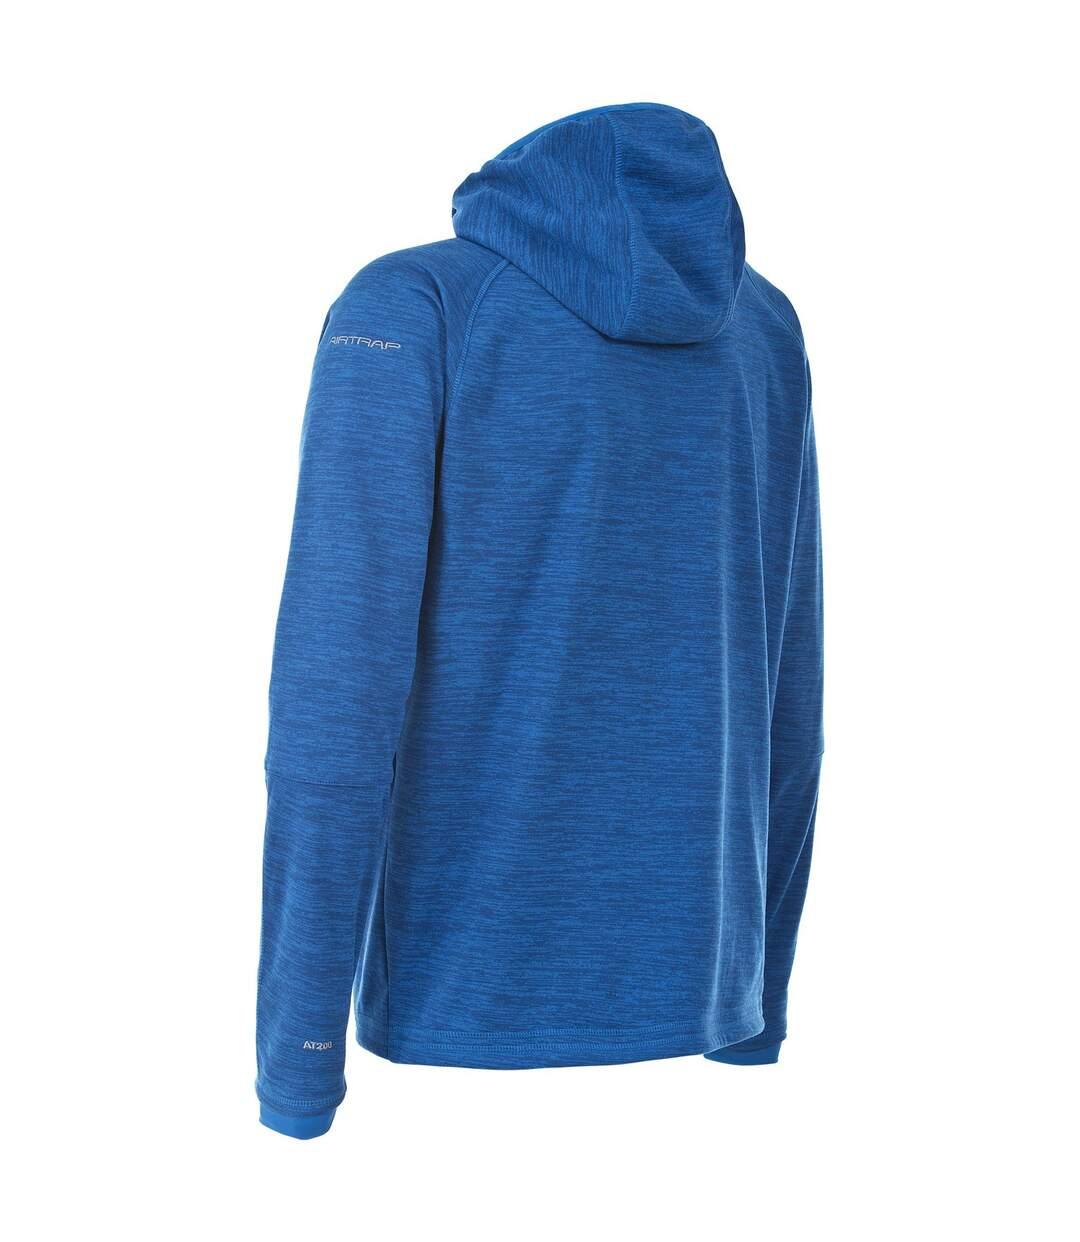 Trespass Mens Northwood Full Zip Fleece Hoodie (Bright Blue Marl) - UTTP3219